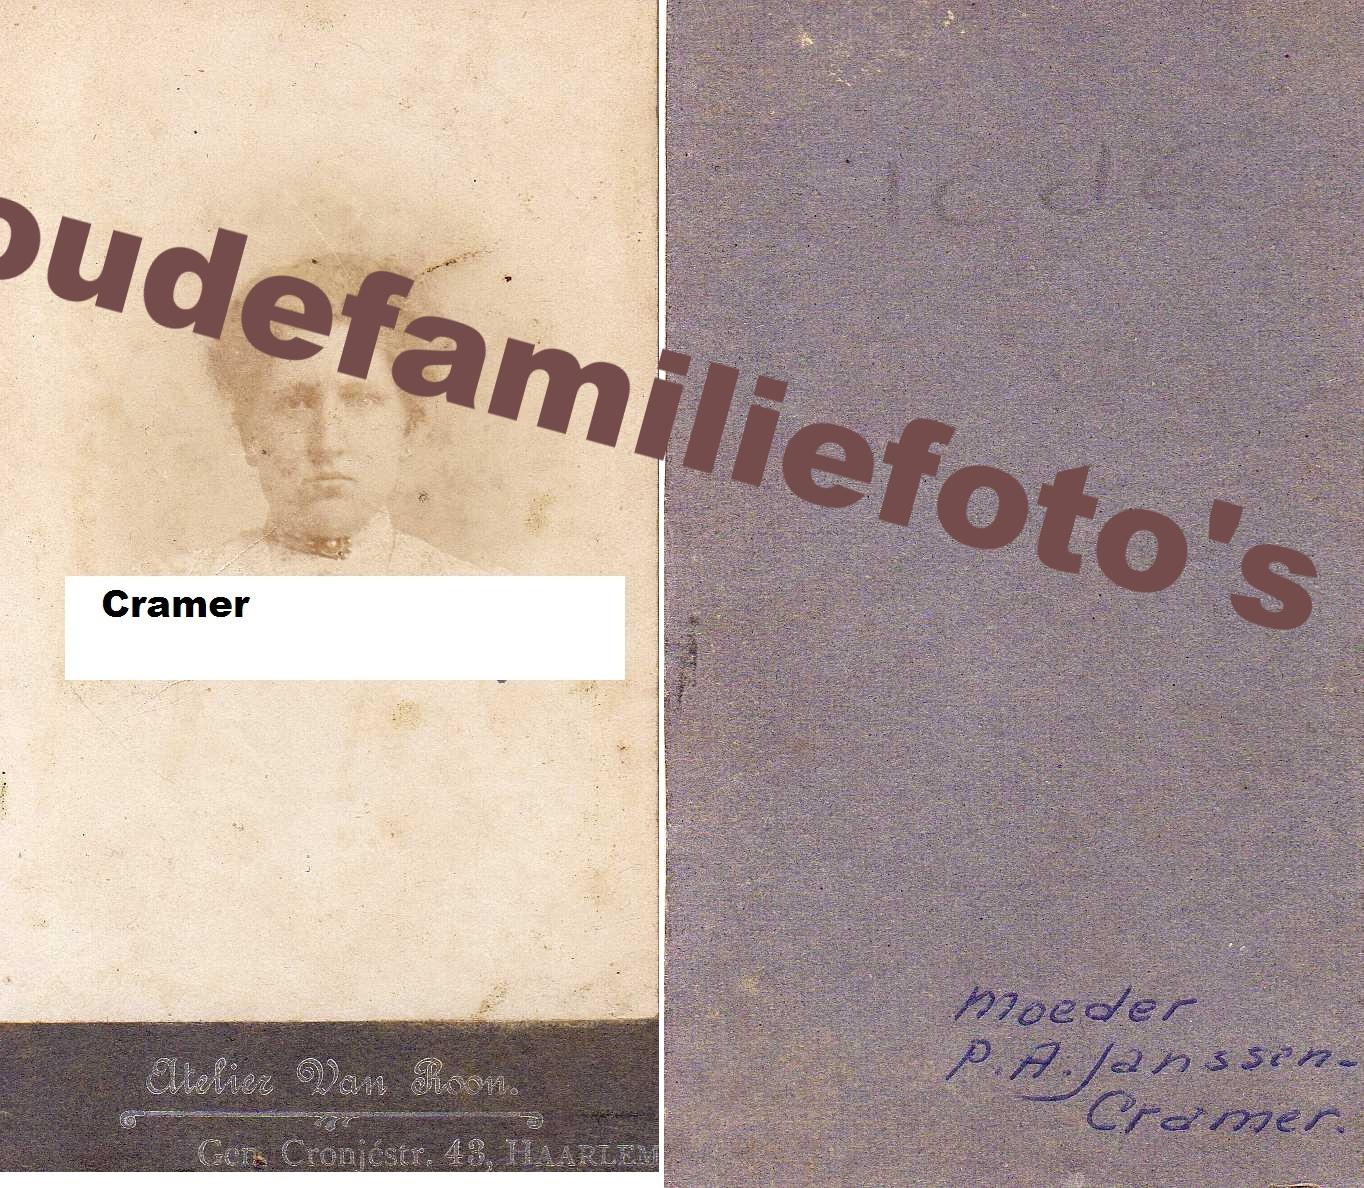 Cramer, Petronella Antonia geb. 18 januari 1884 getrouwd Bernardus Petrus Janssen € 3,00